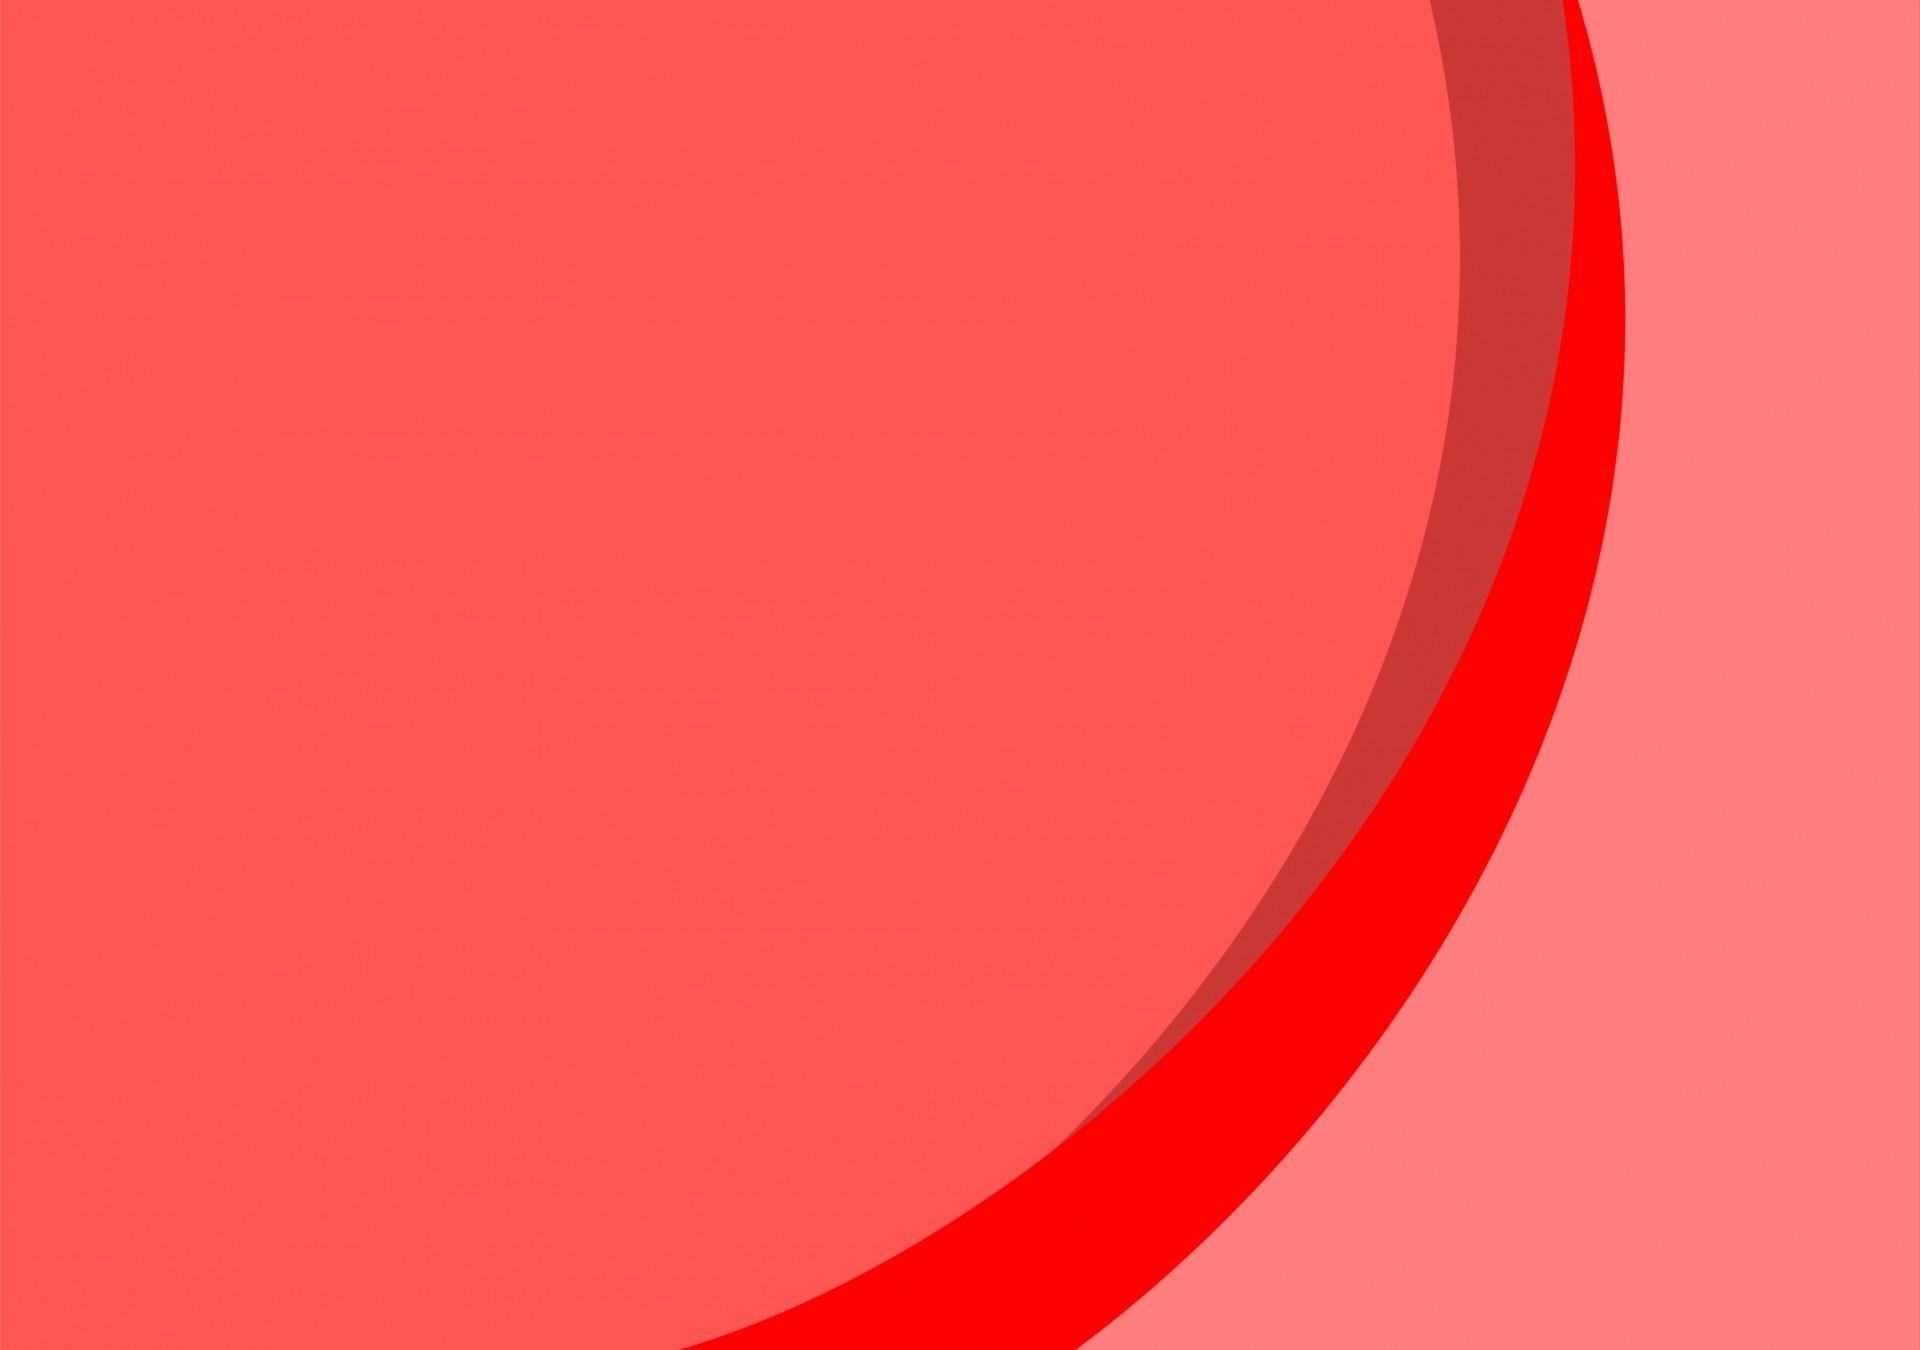 Number 8 Red Background Clip Art at Clker.